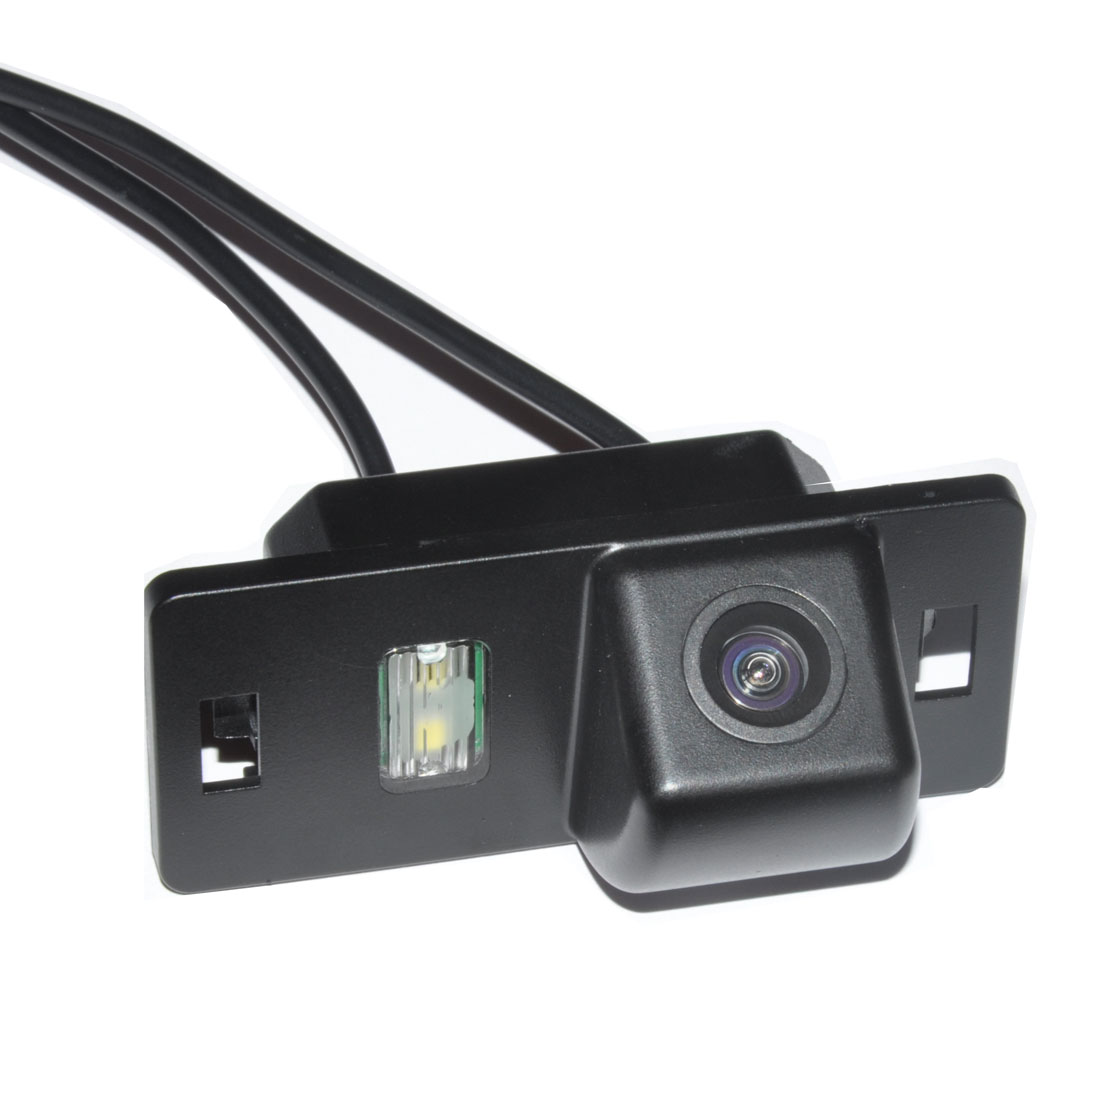 Car Rear View Reverse Parking Camera Waterproof Night Vision Camera for Audi A1 A3 A4 A5 A6 RS4 TT Q5 Q7 Volkswagen Passat R36